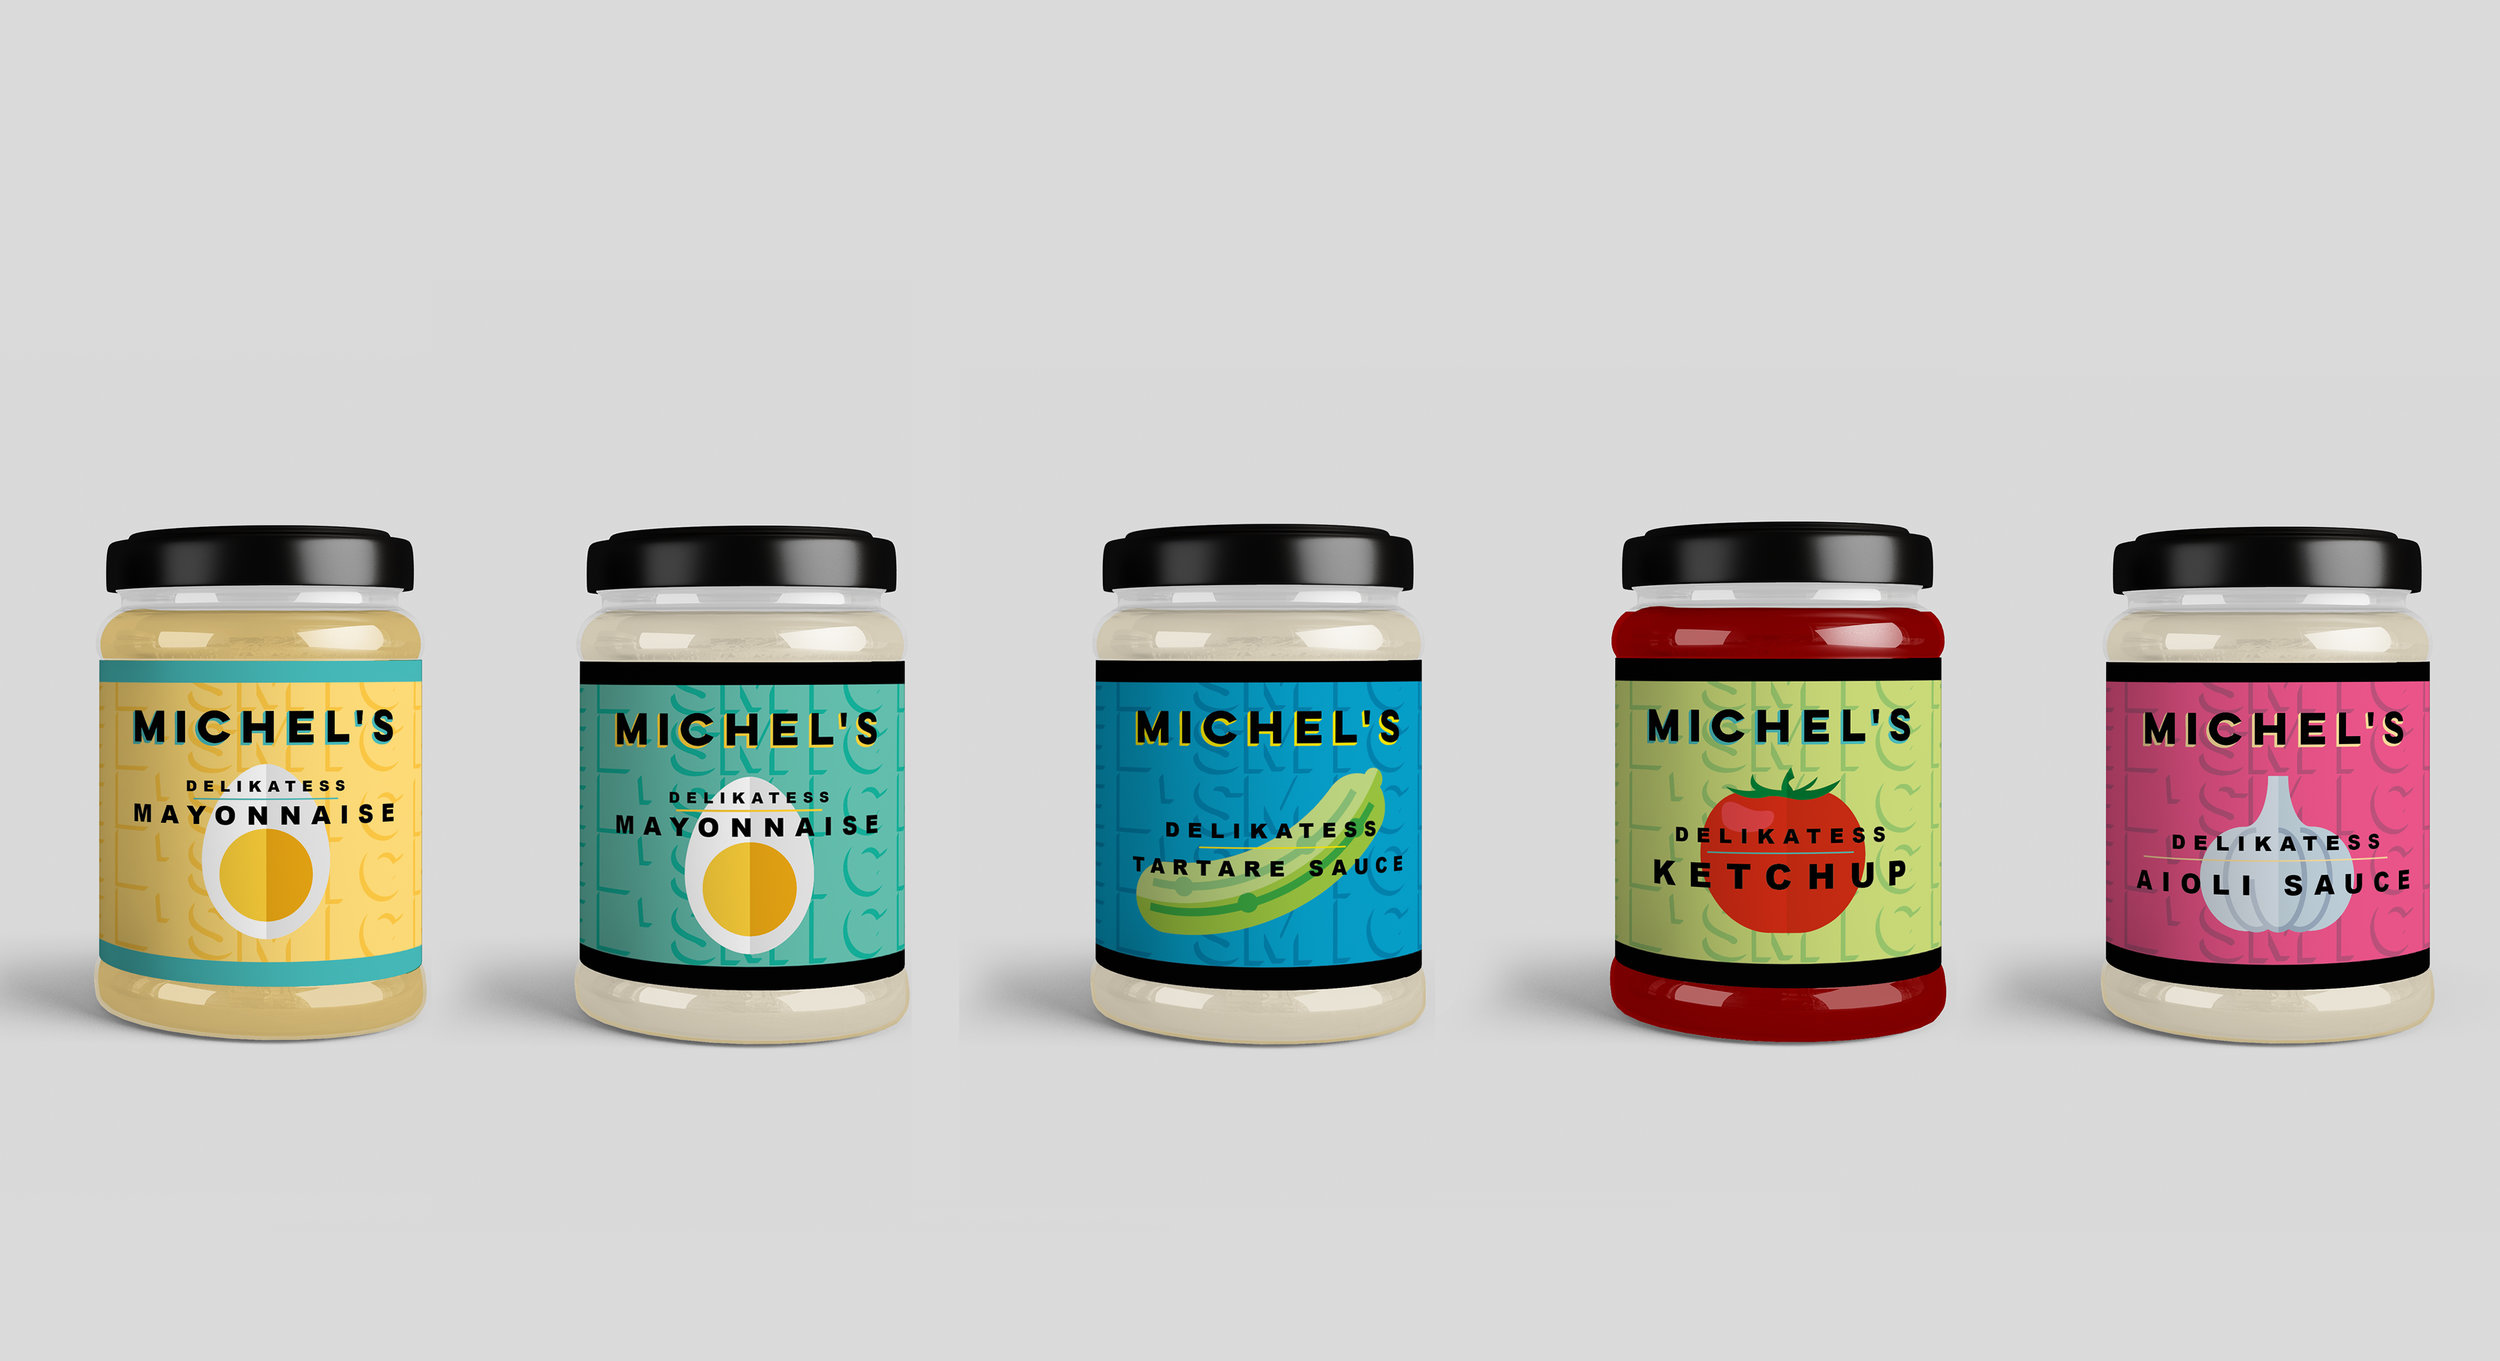 02900218_Michels_Logo_Design_Packaging_Mayonnaise_Jar_3.jpg